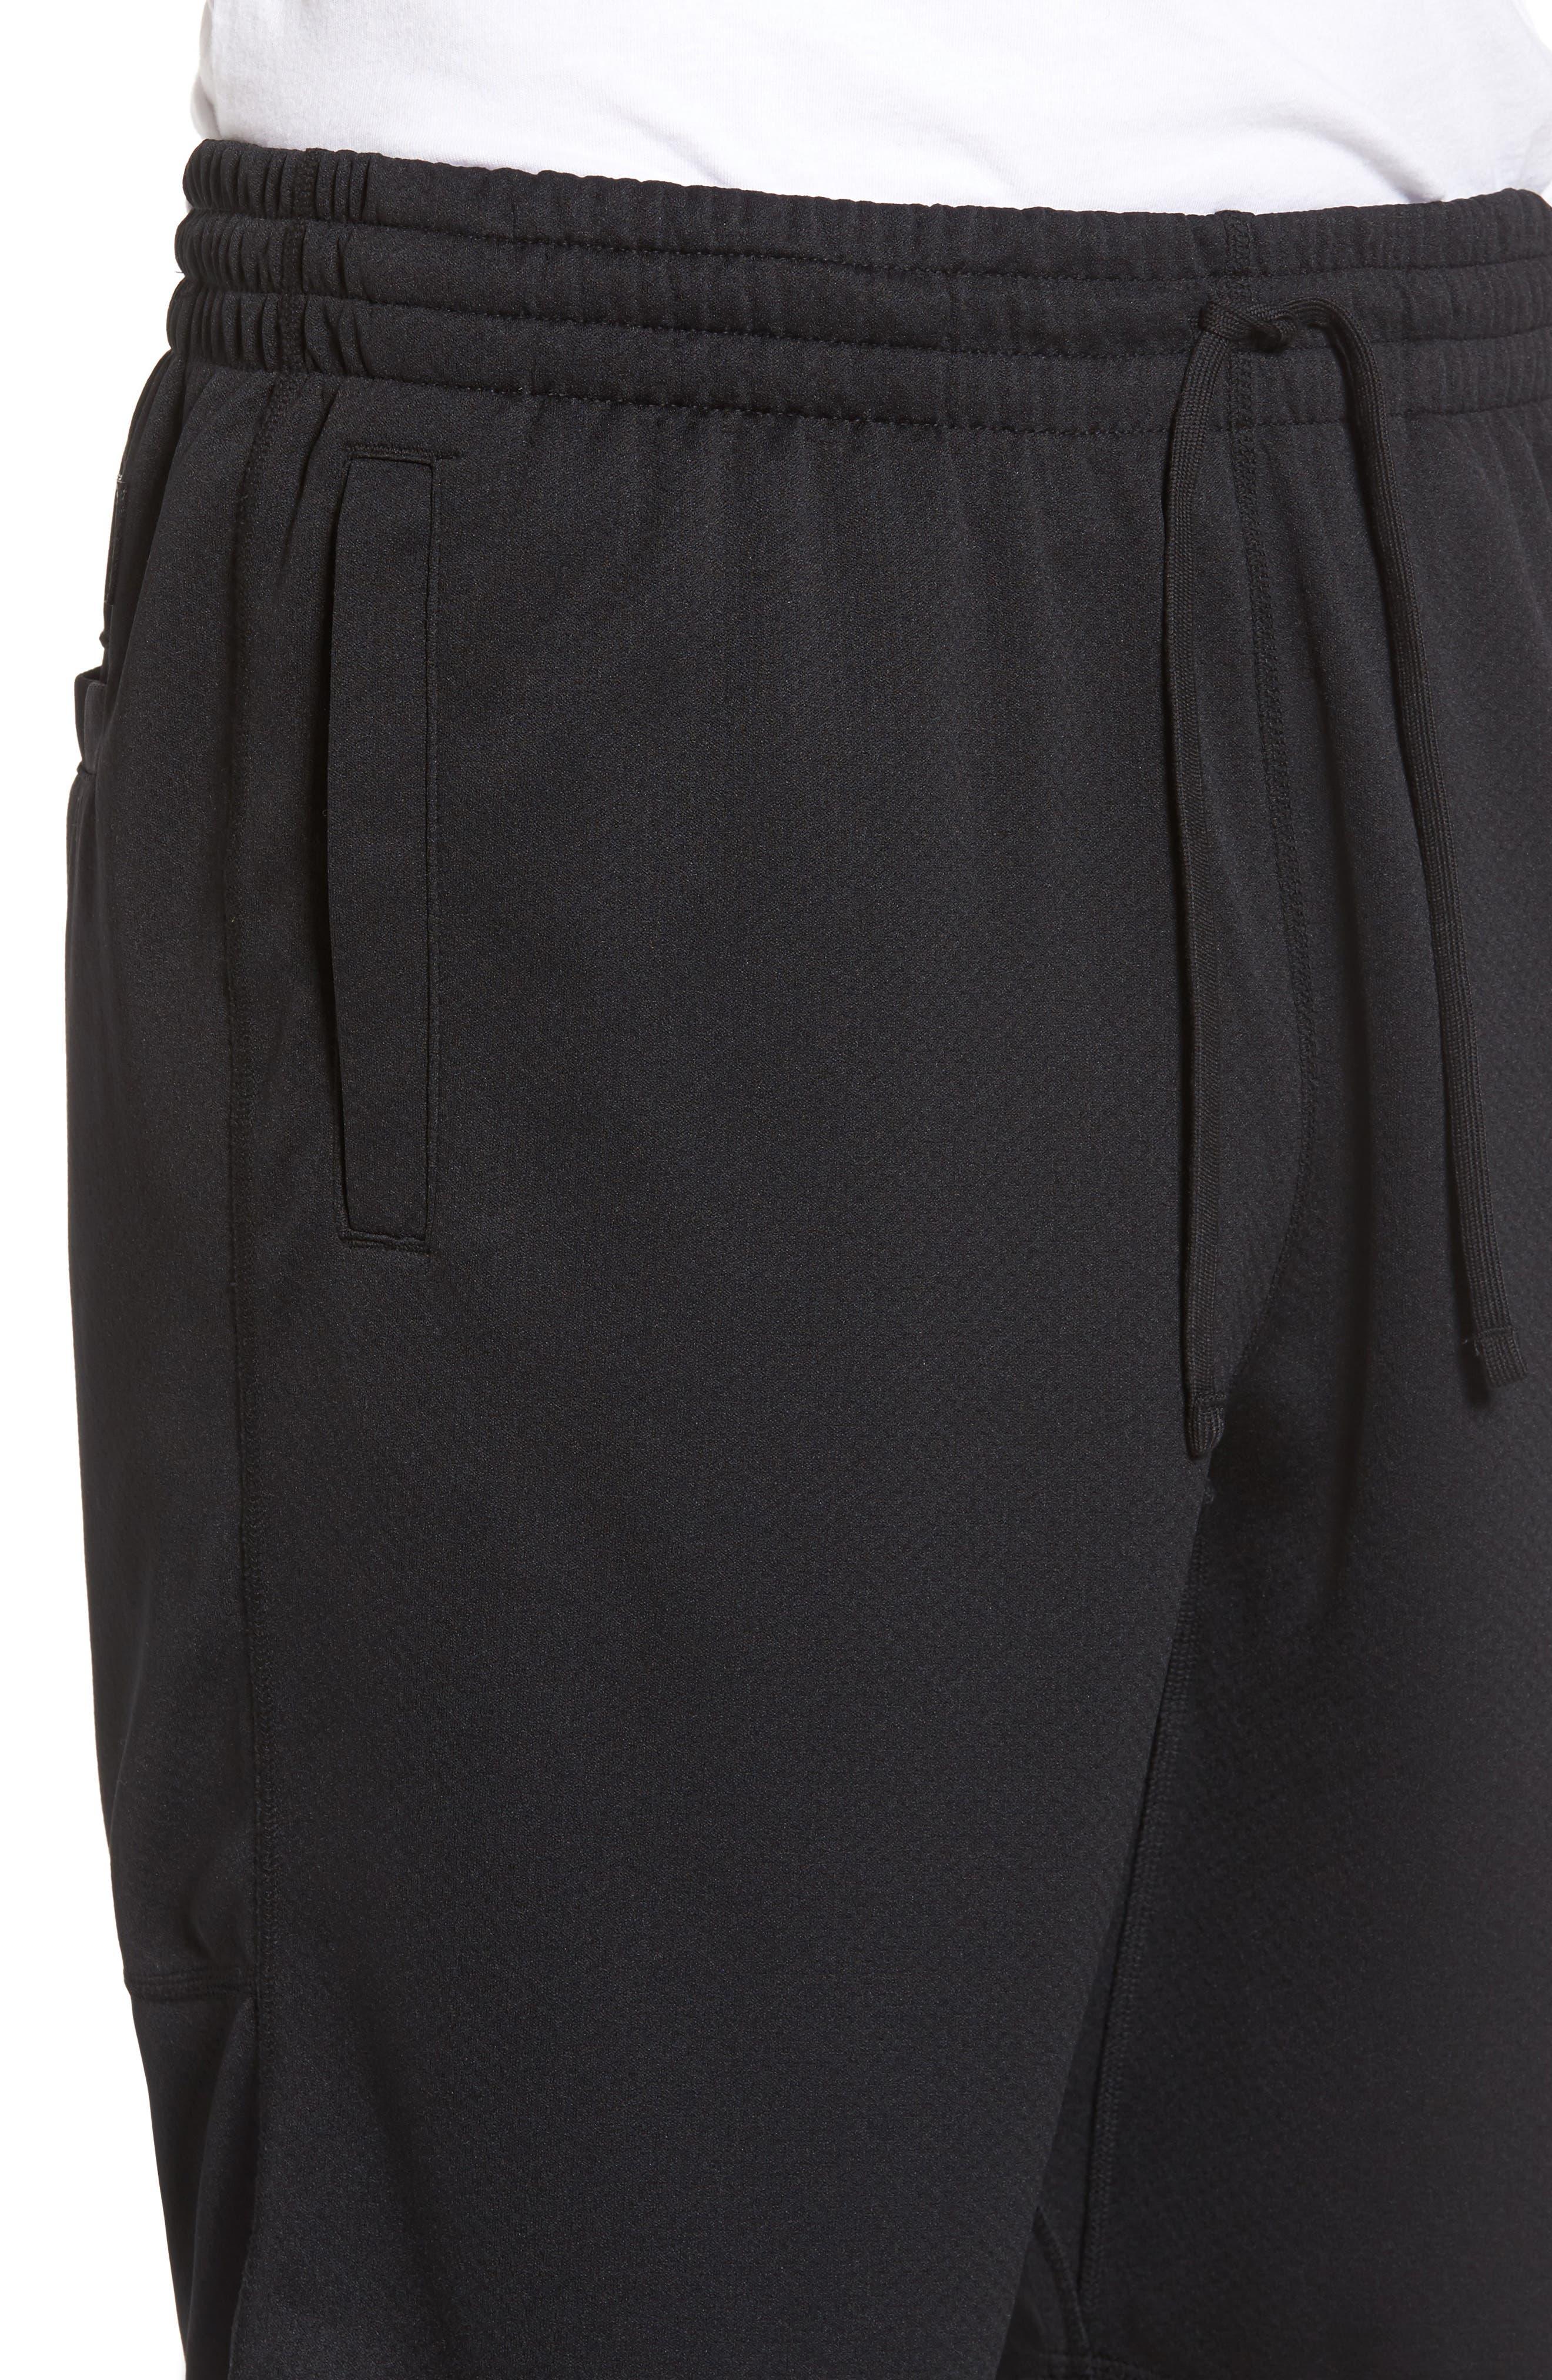 Dri-FIT Sunday Active Shorts,                             Alternate thumbnail 4, color,                             010